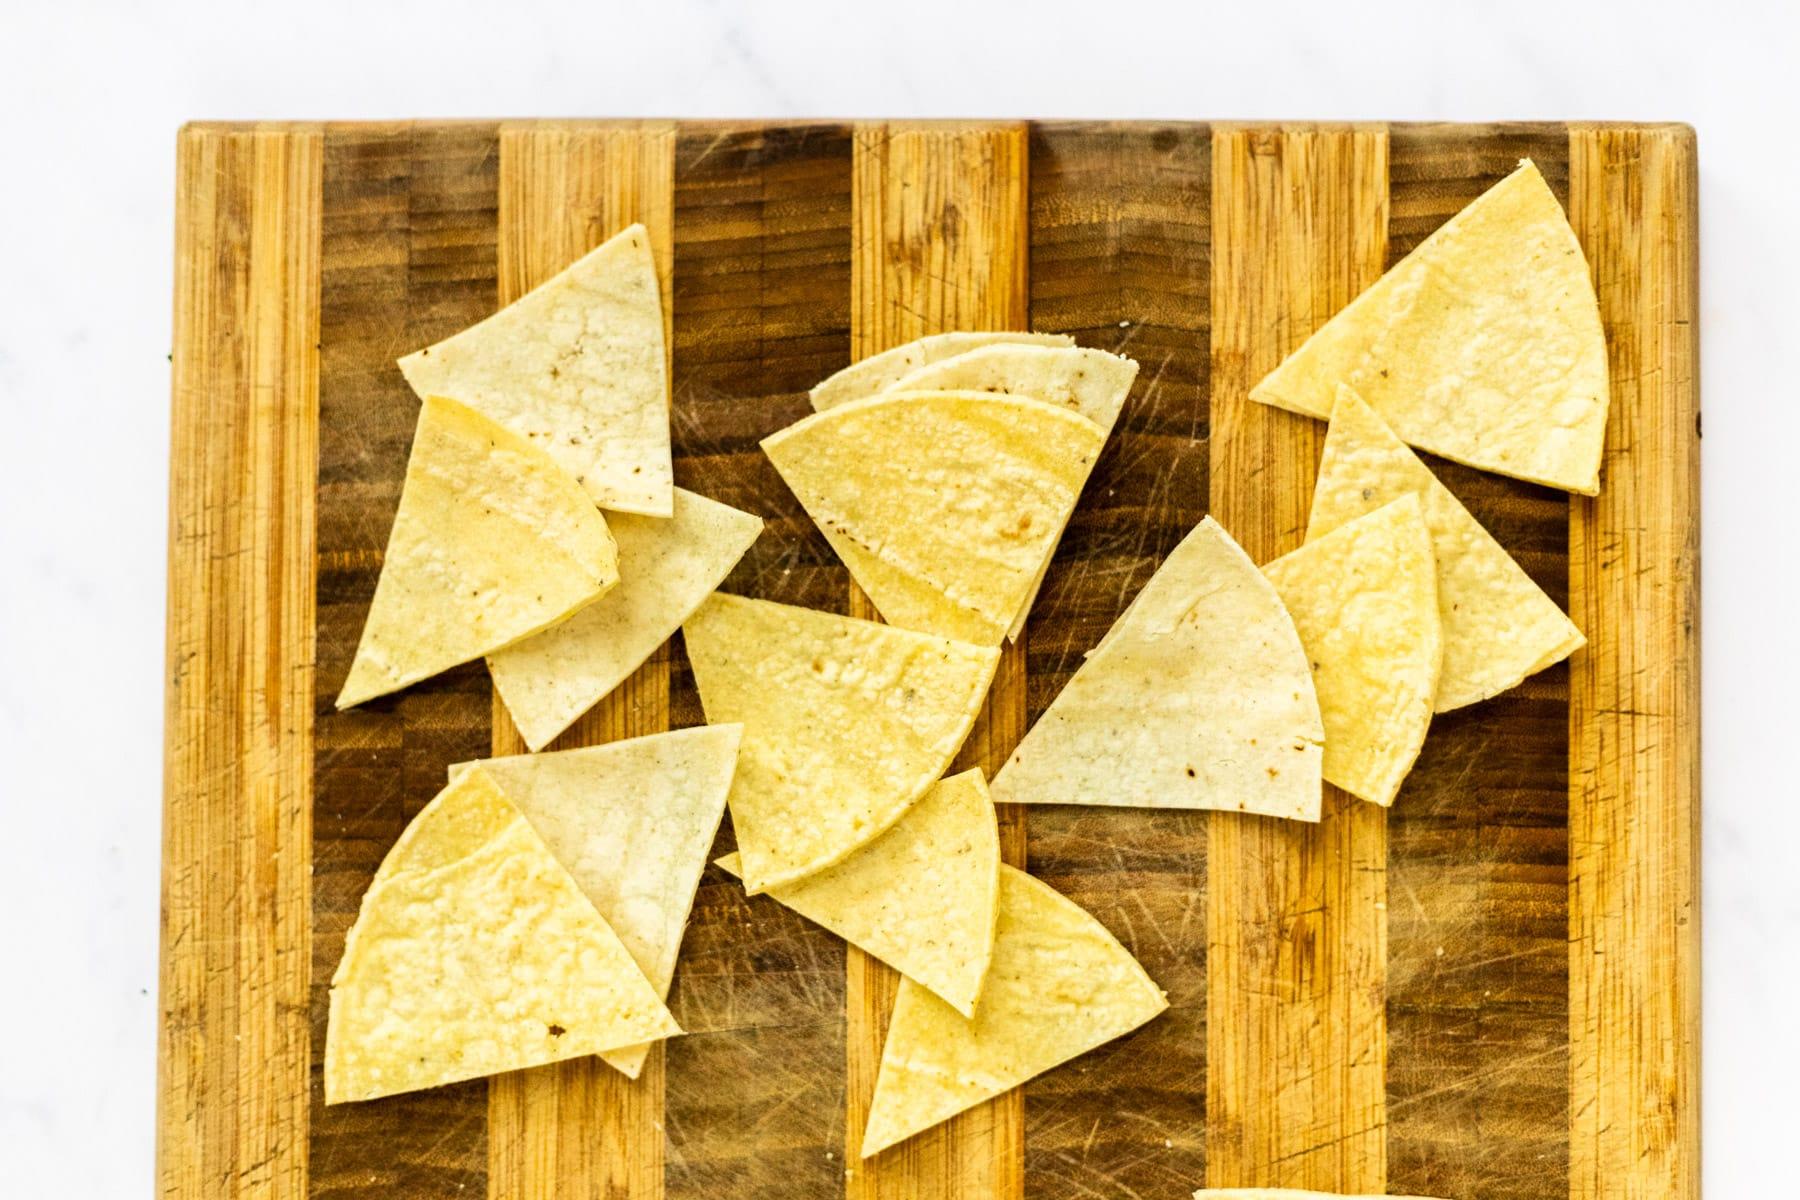 corn tortillas cut into triangles on a cutting board.